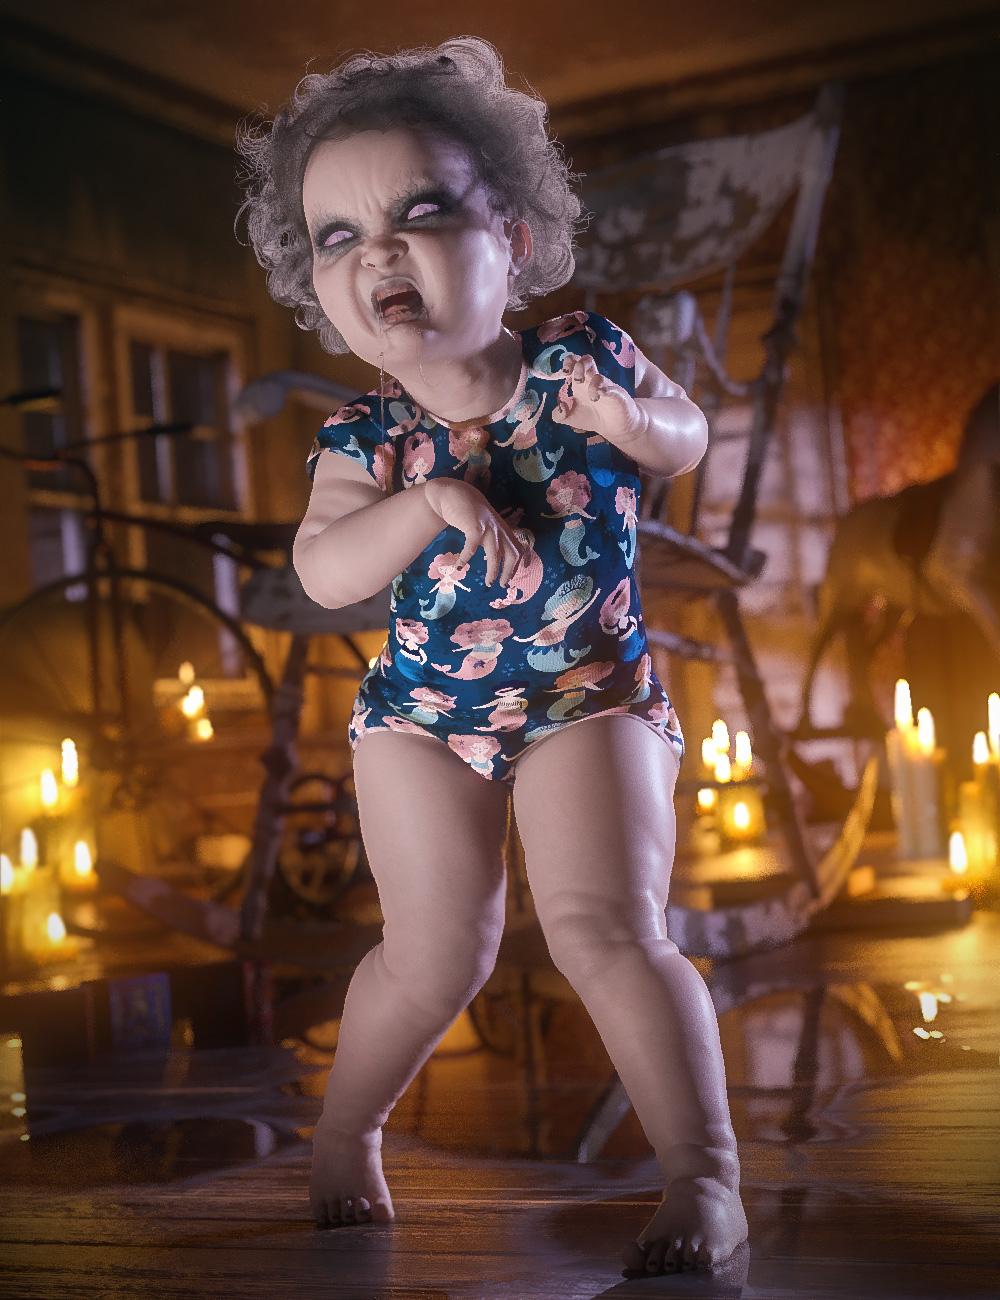 Ebil Baby for Caryn 8 by: Cris Palomino, 3D Models by Daz 3D